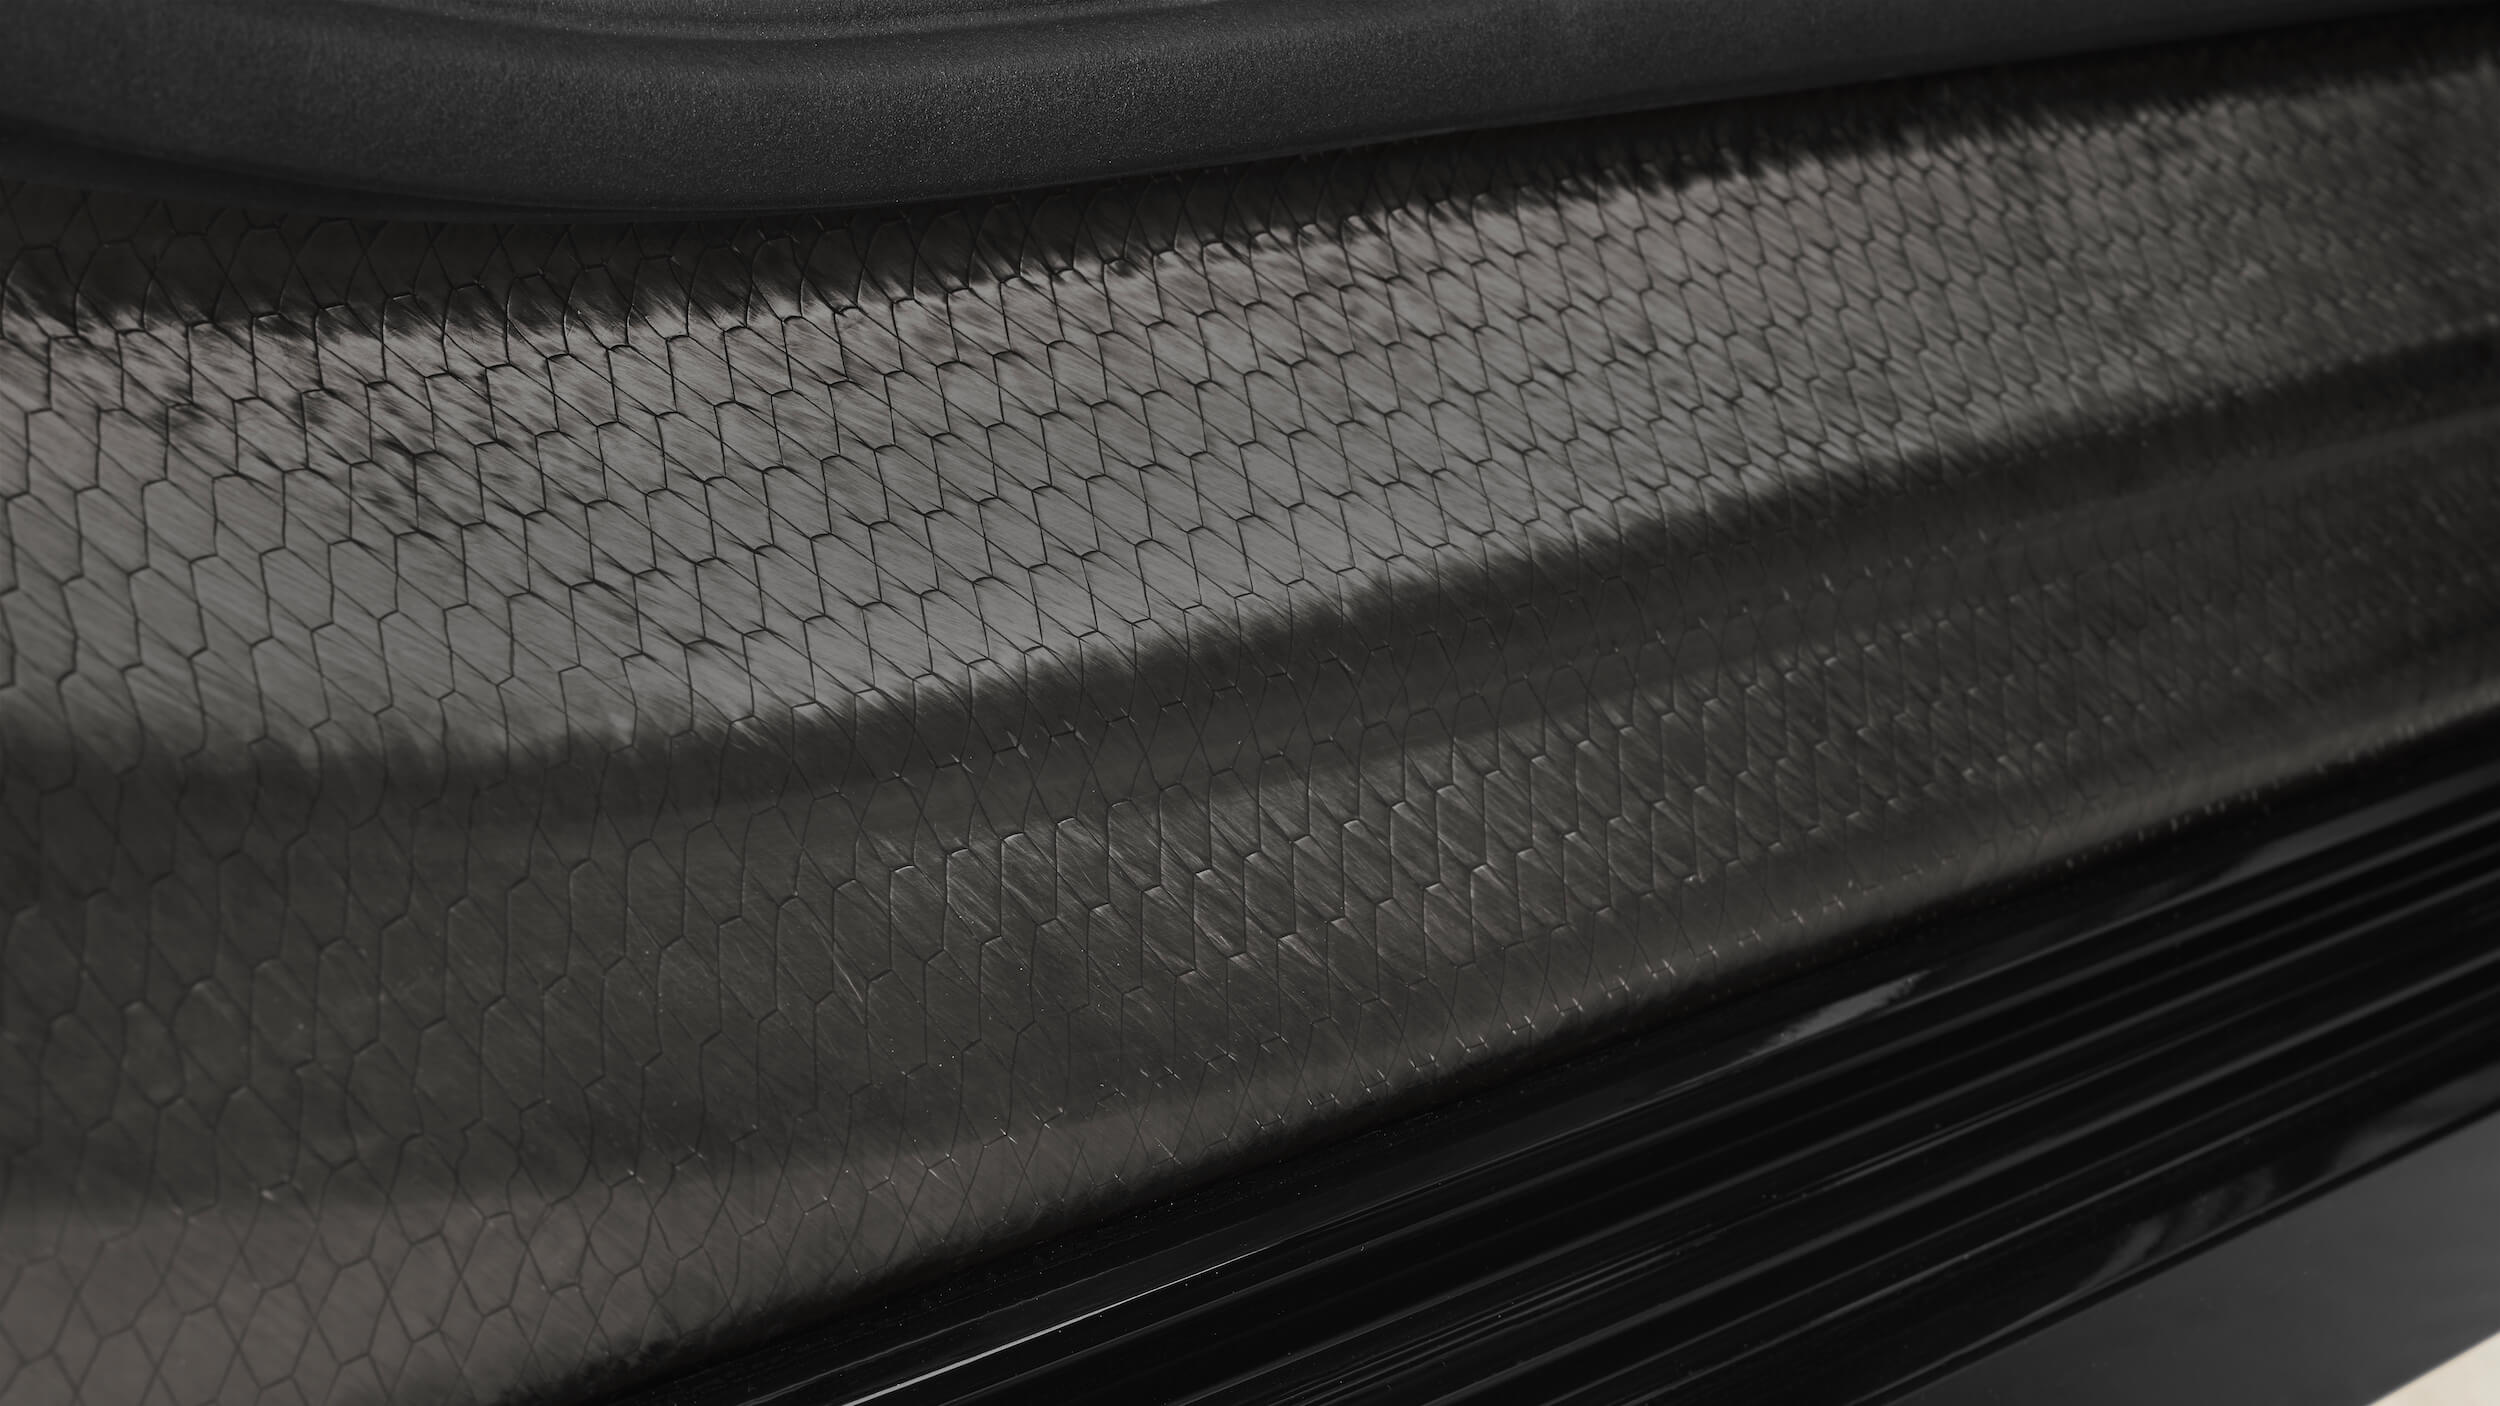 BMW iX carbon